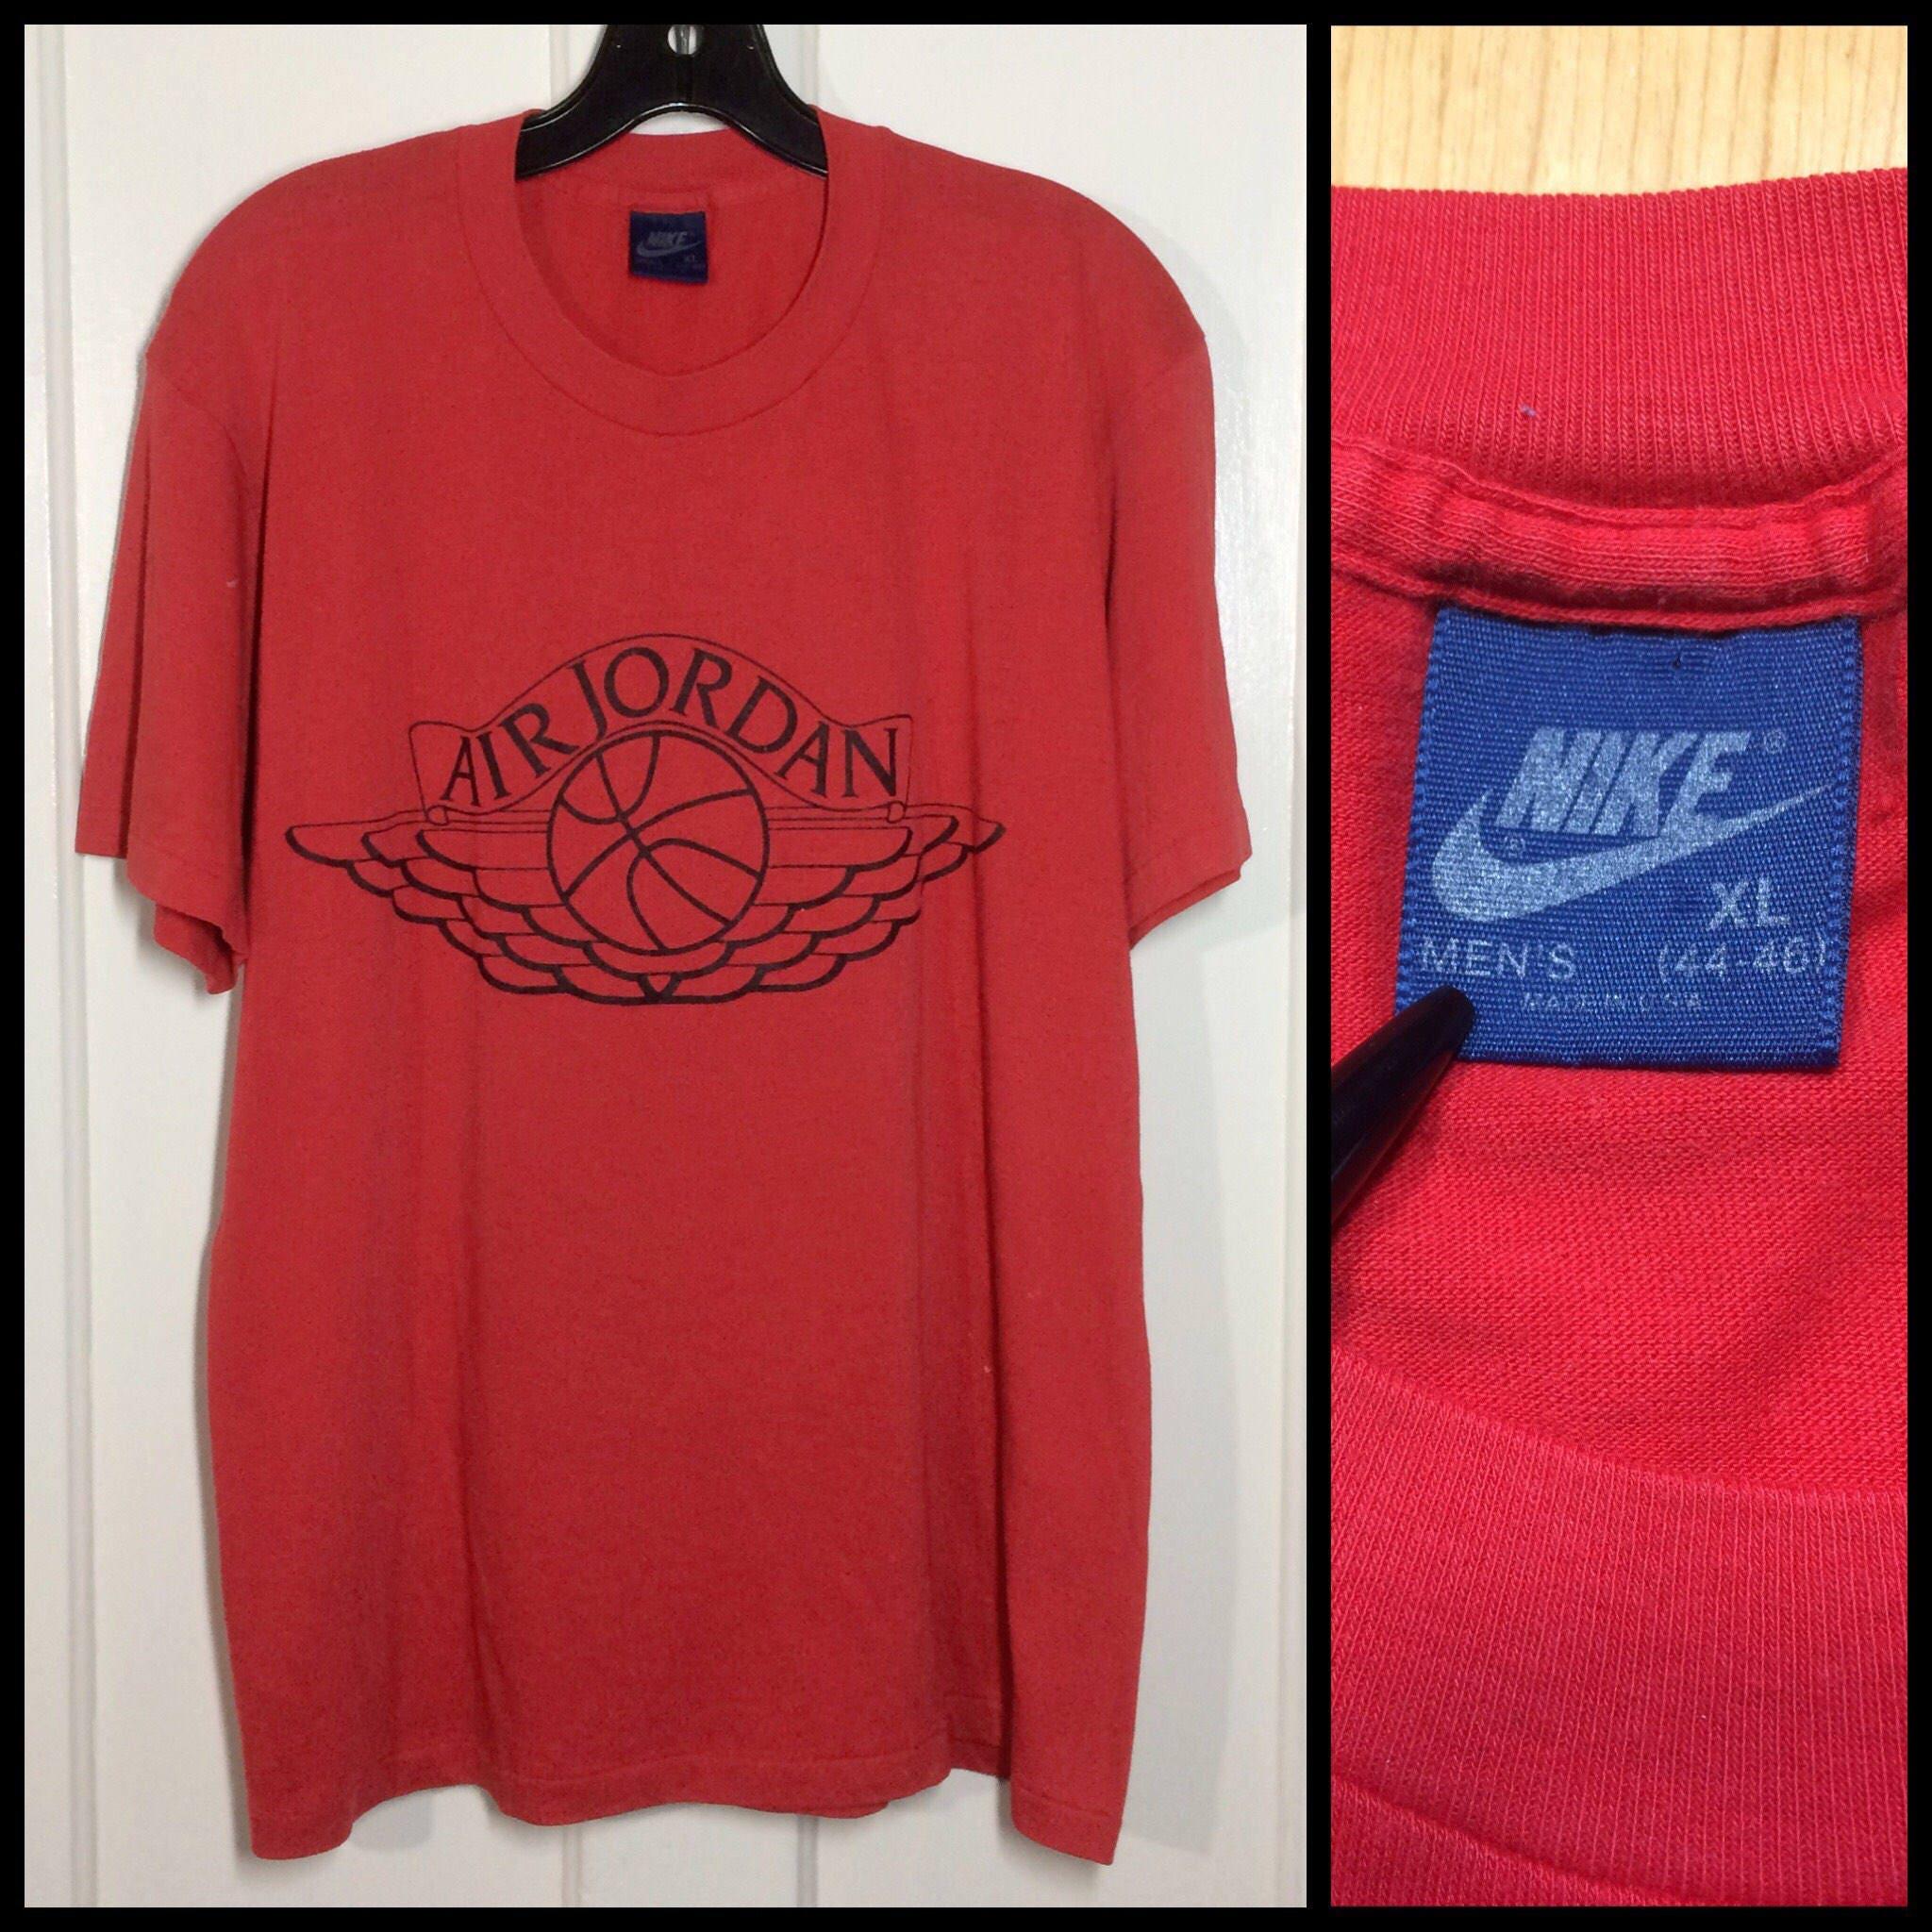 d9f2dc1017e679 AJ1 1980 s Nike Air Jordan 1 basketball wings t-shirt size XL 21x27 ...